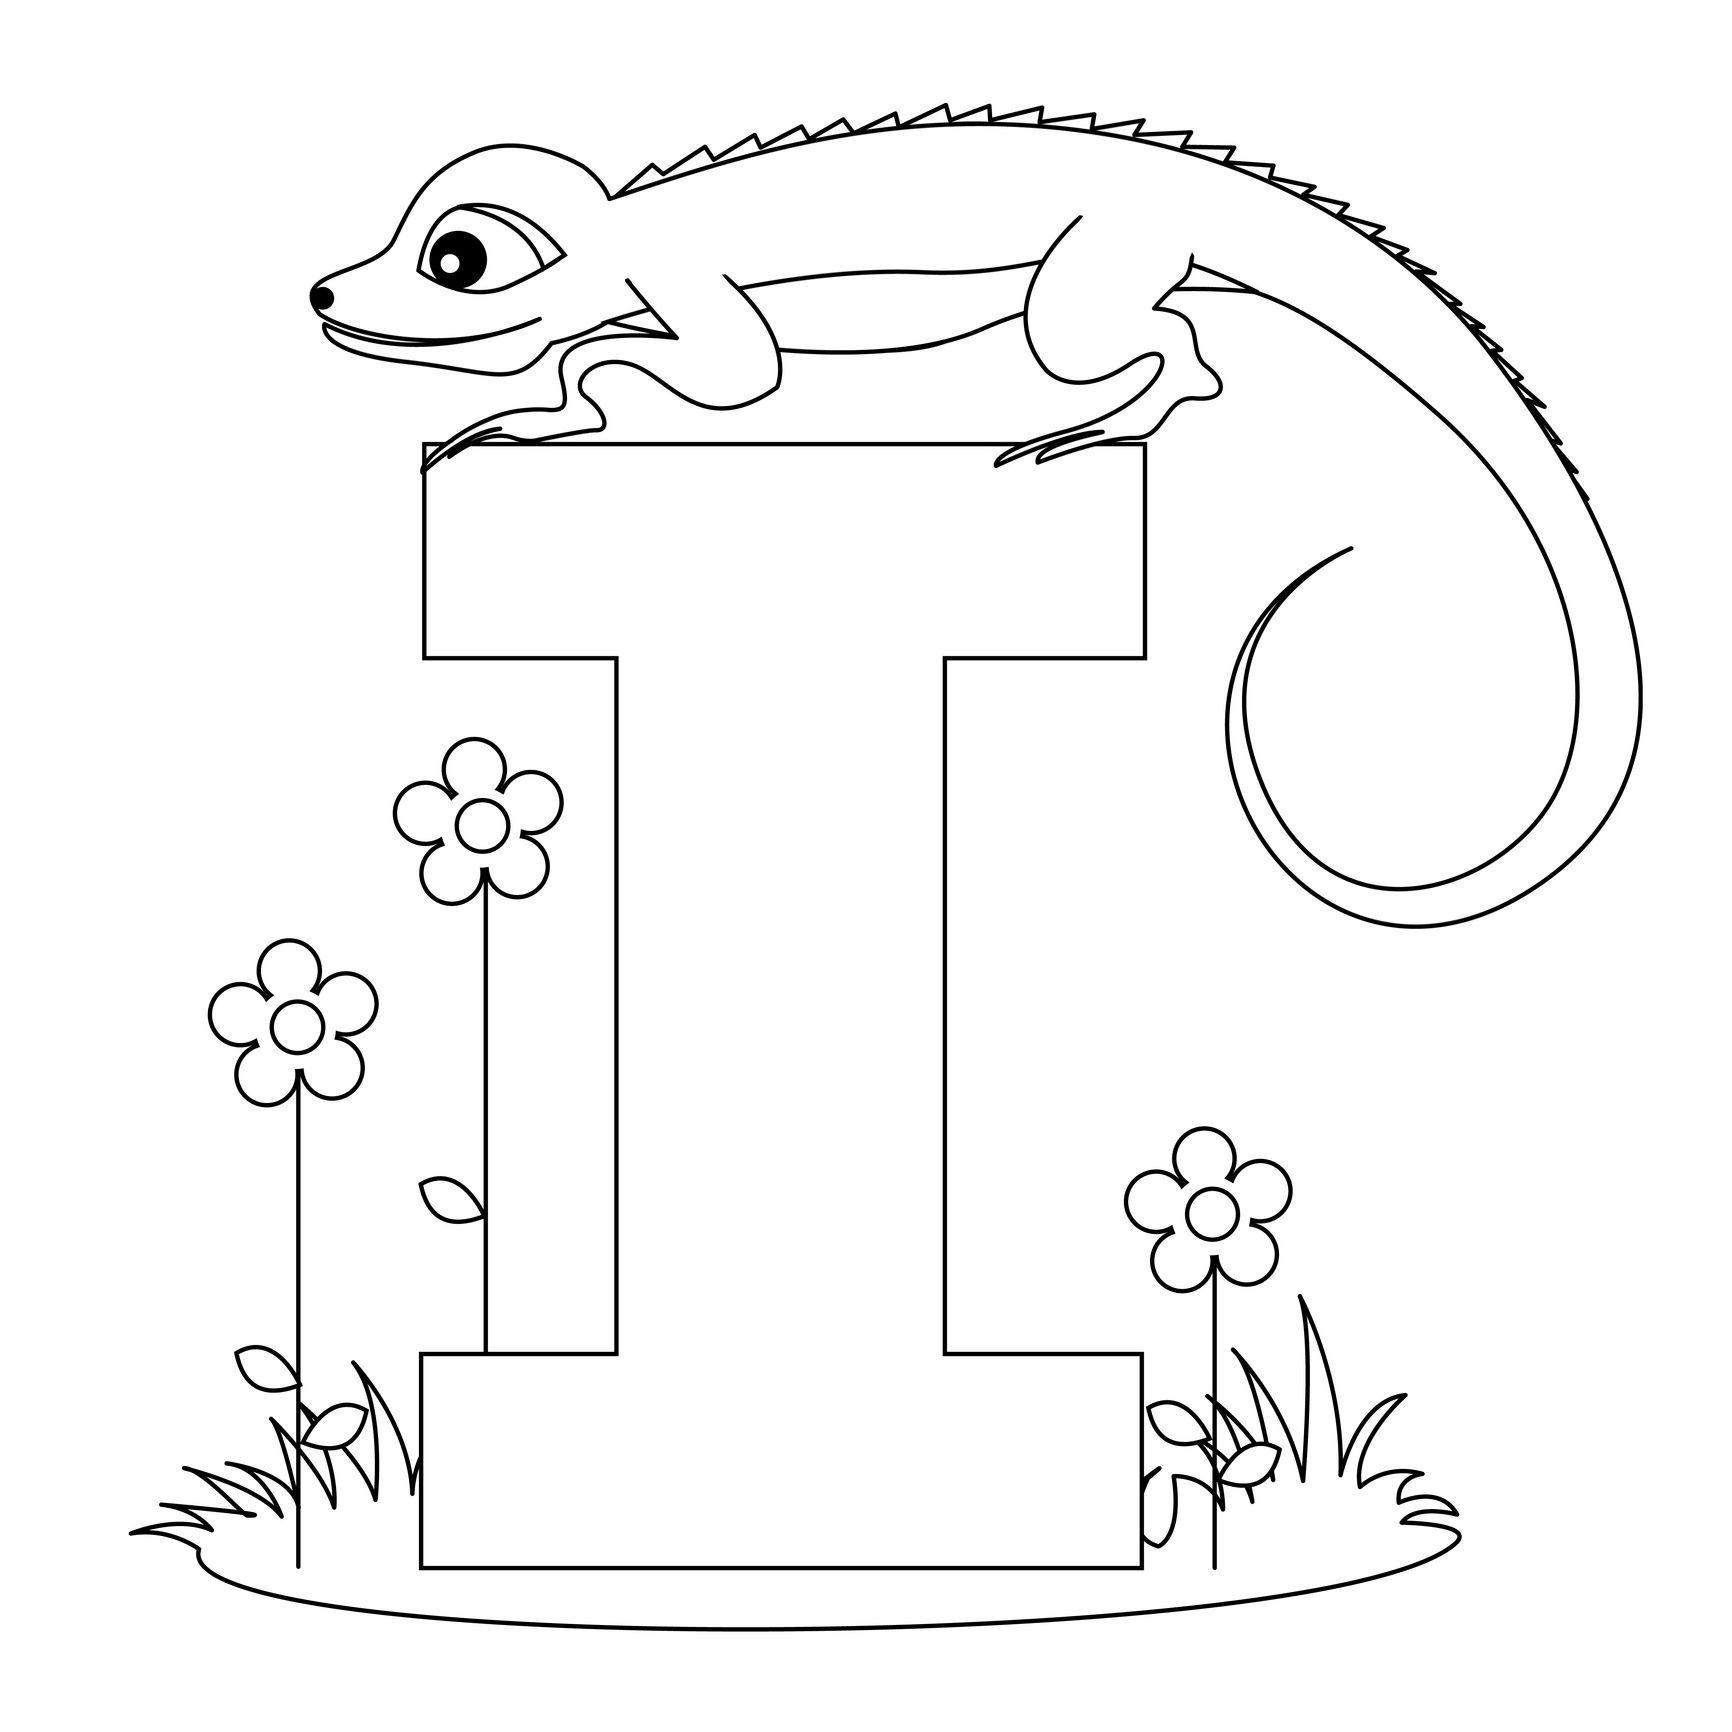 Image detail for -Animal Alphabet: Letter I Coloring ...